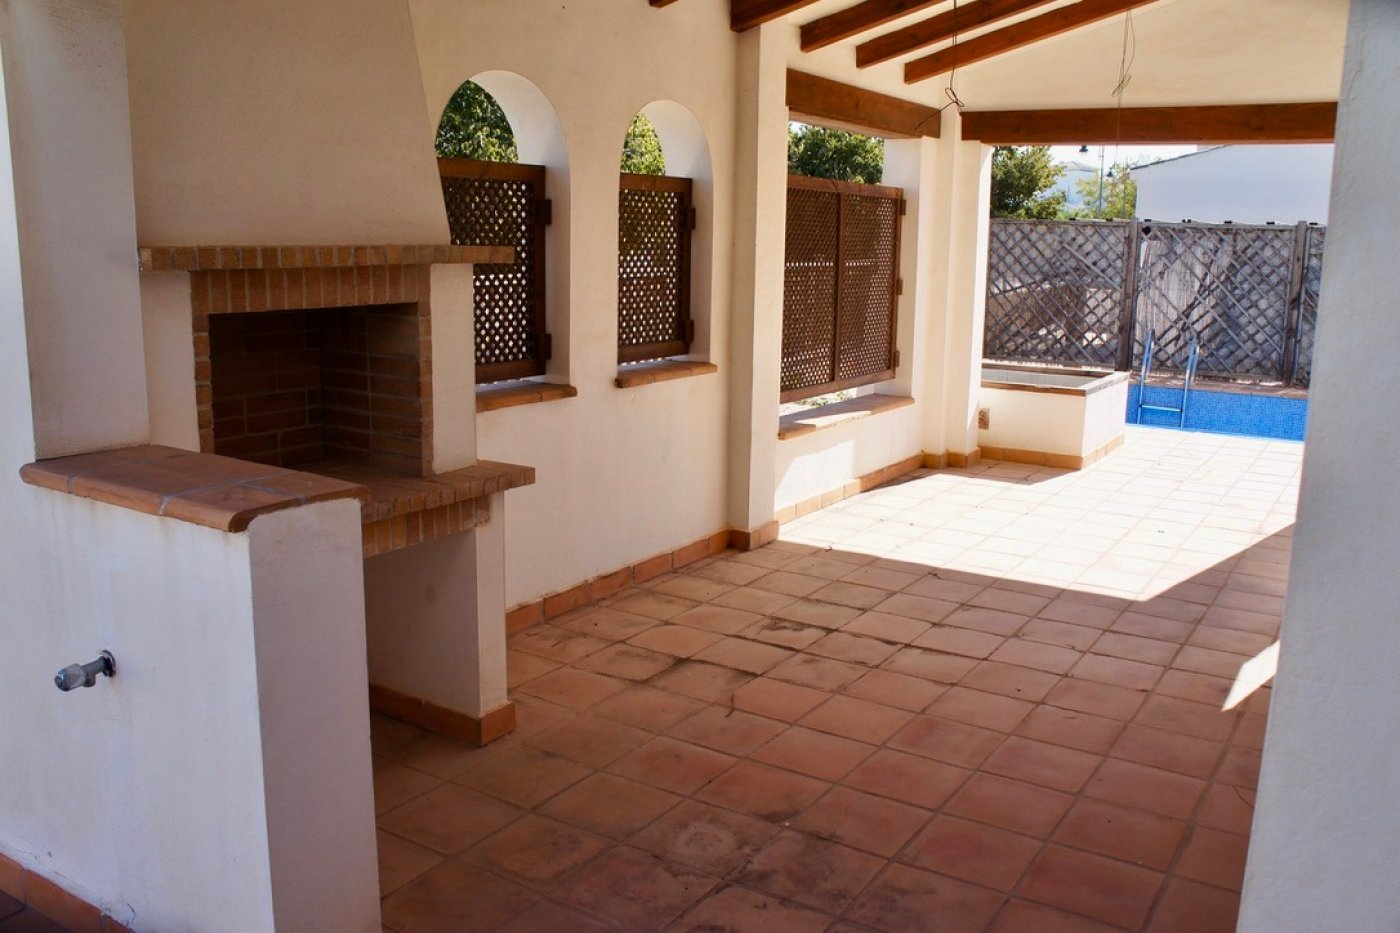 Gallery Image 3 of Fantastic offer - bank repossessed south facing villa on EL Valle Golf Resort